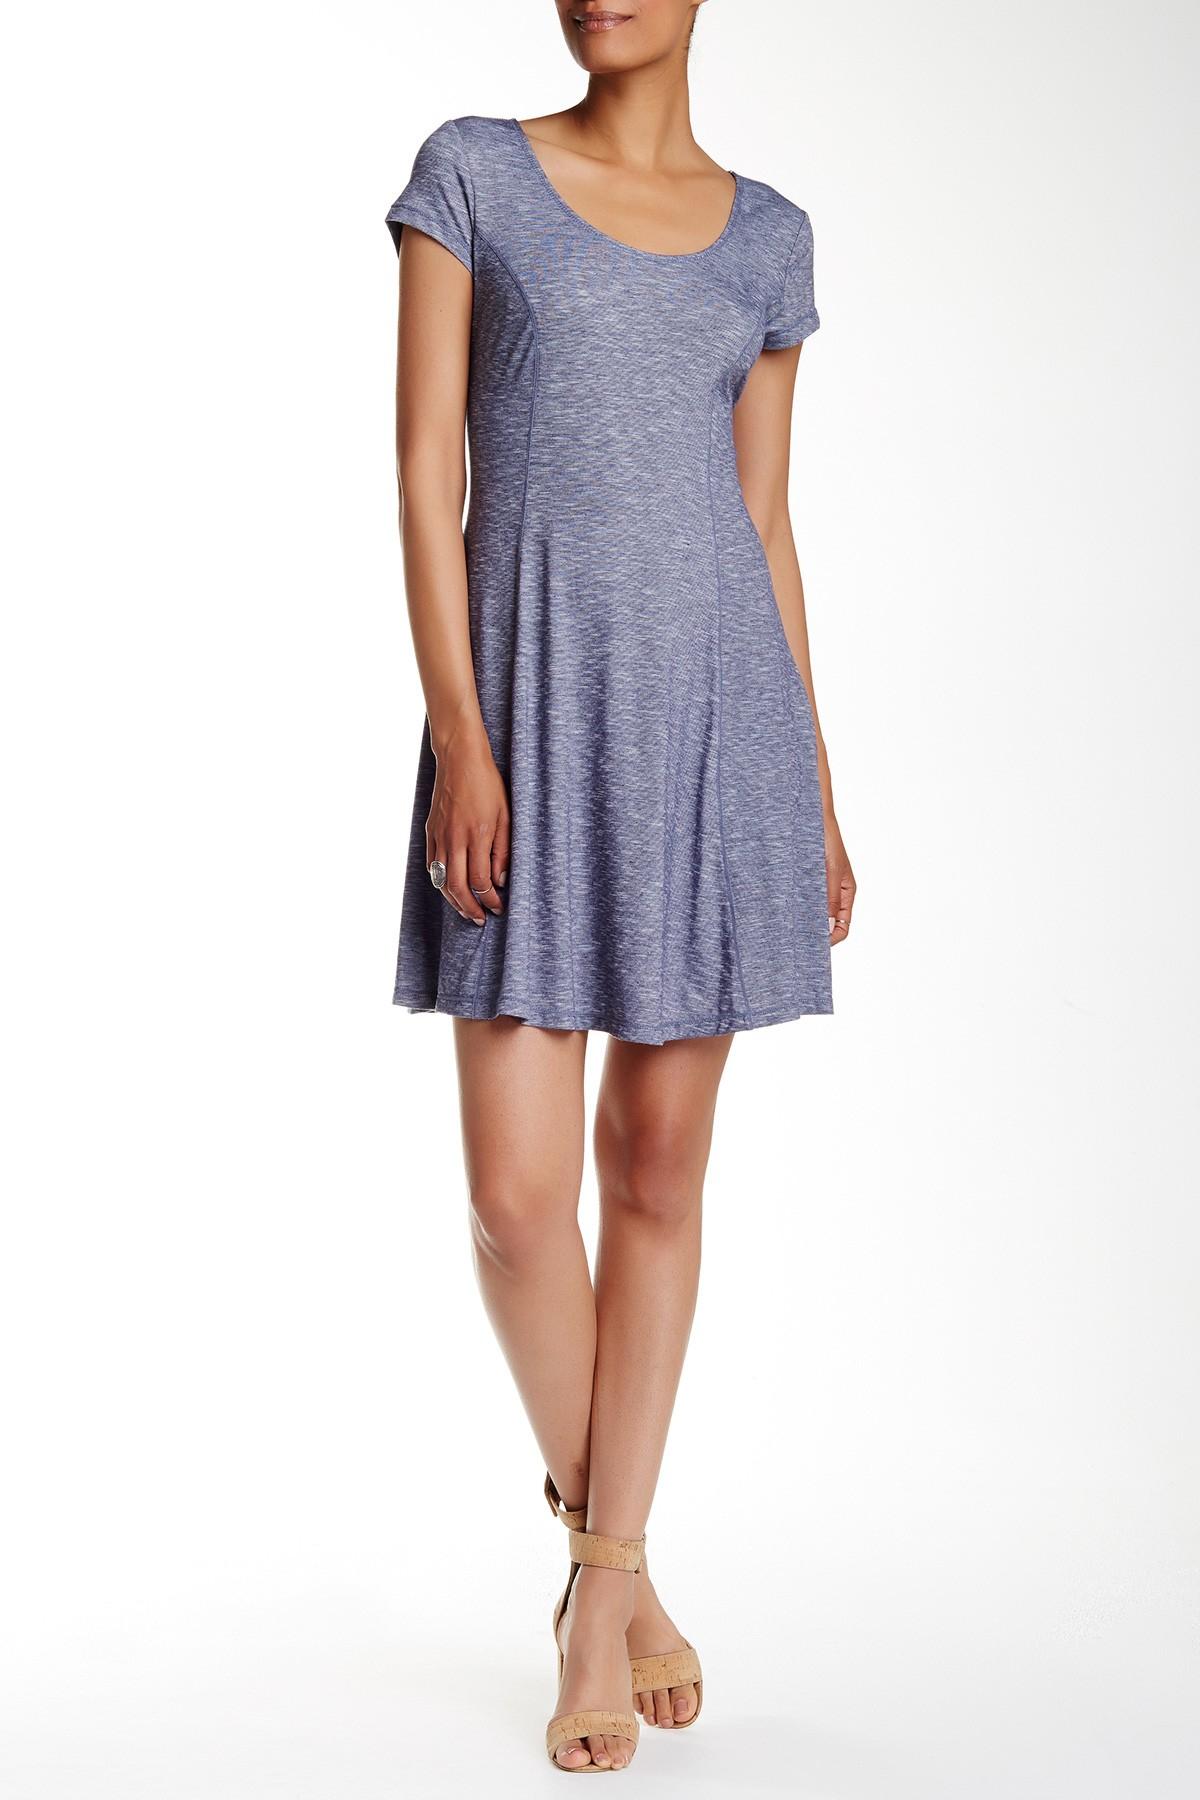 Max Studio Short Sleeve Endoend Flare Dress Lyst